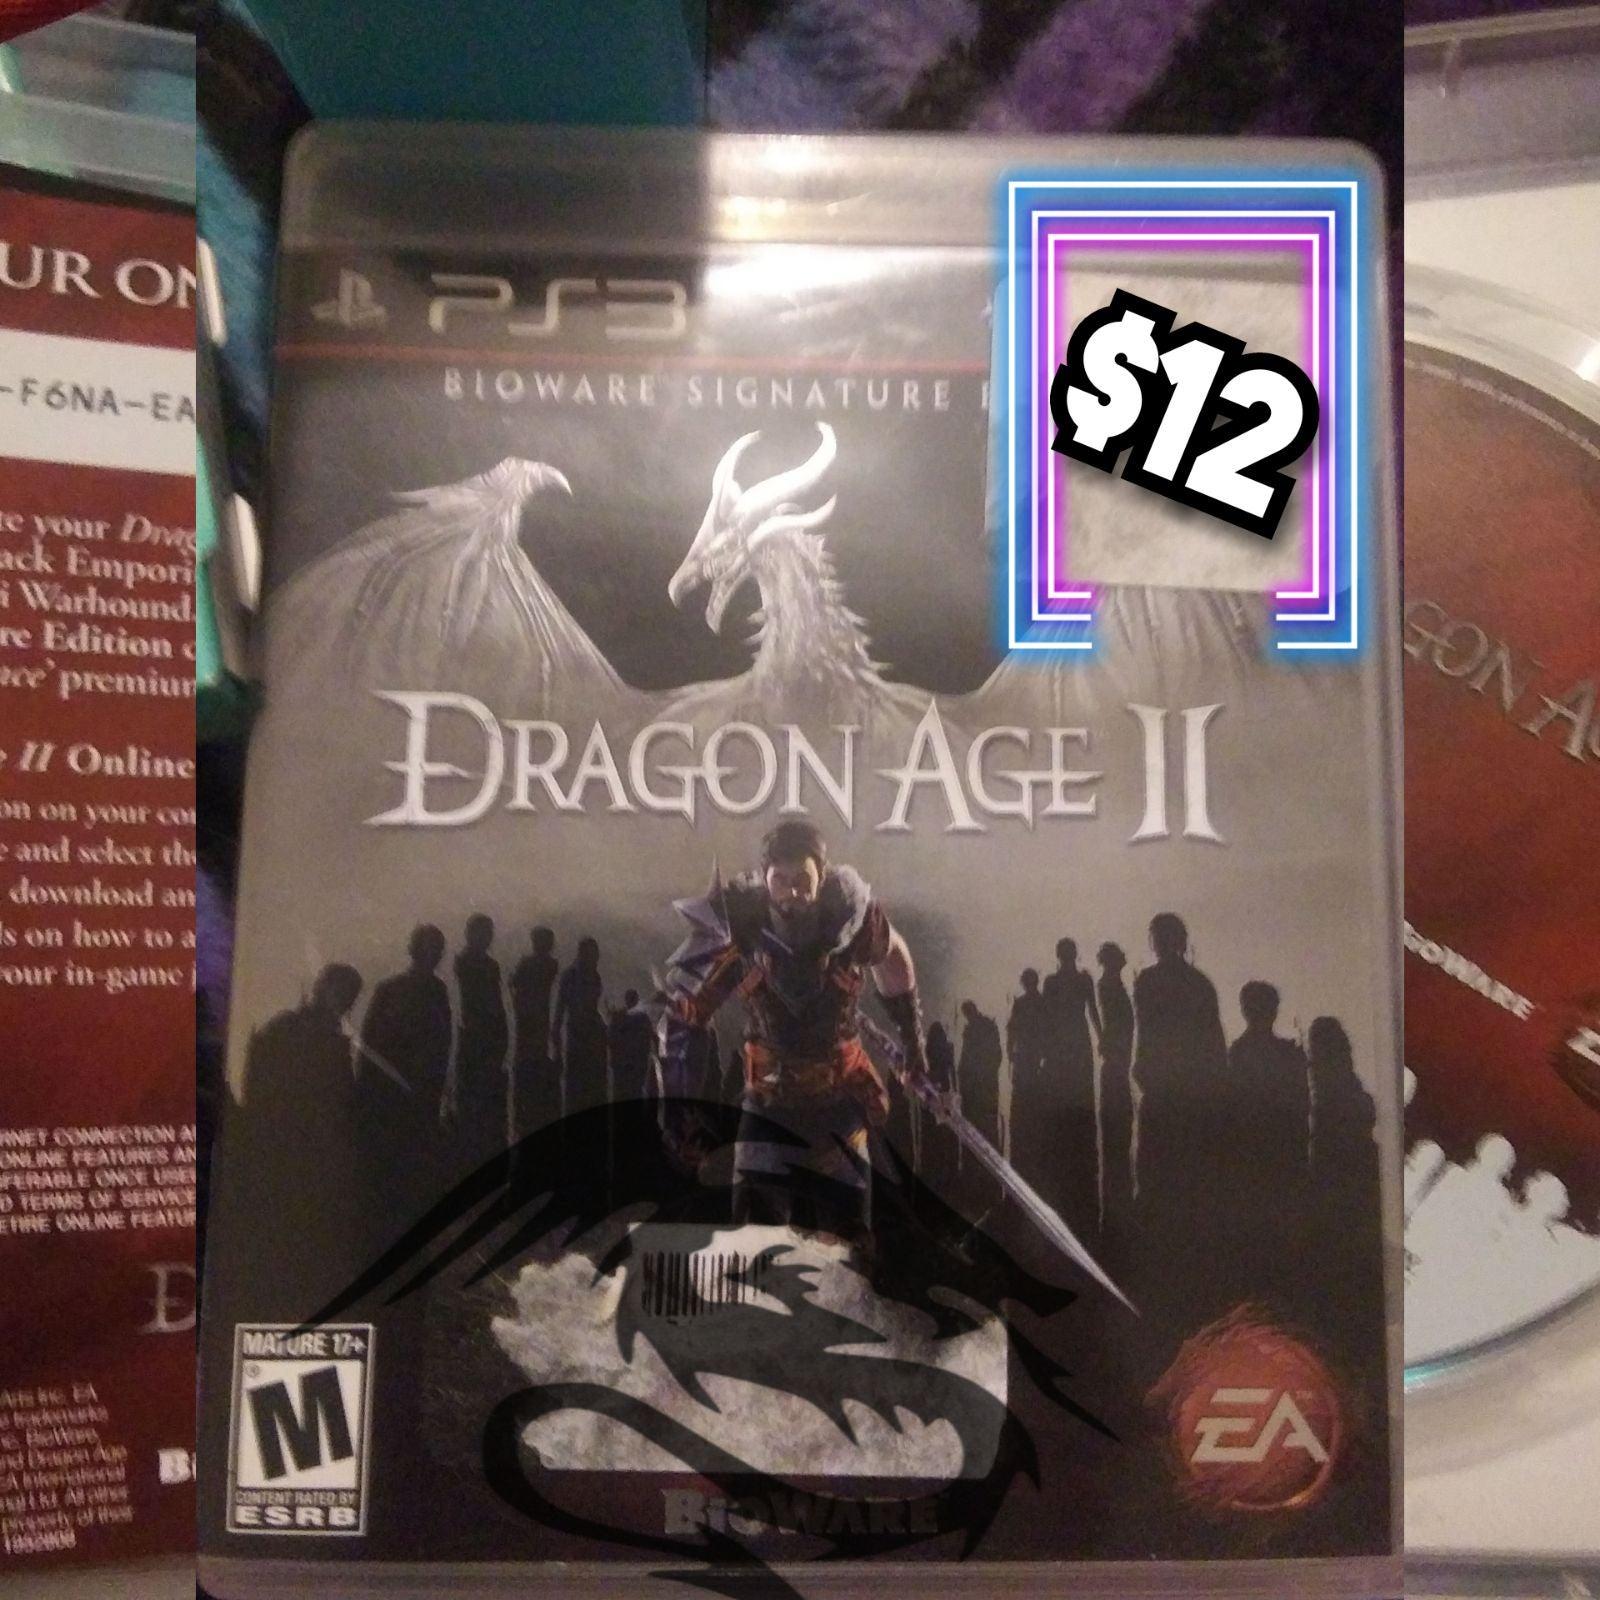 ps3 games Dragon Age II Bioware Signatur